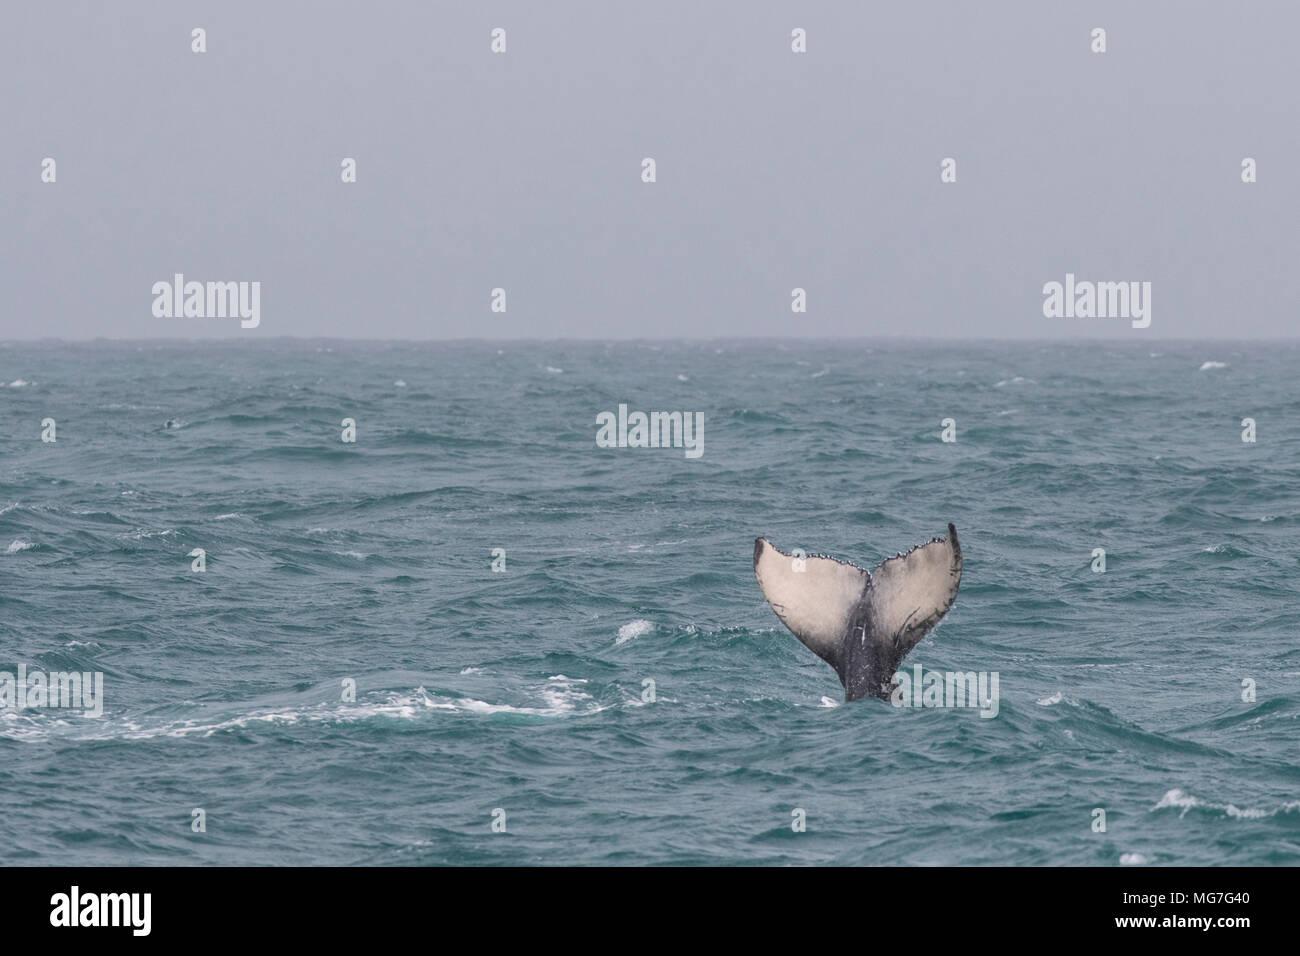 Diving Humpback Whale (Megaptera novaeangliae) calf, Boa Vista, Cape Verde - Stock Image